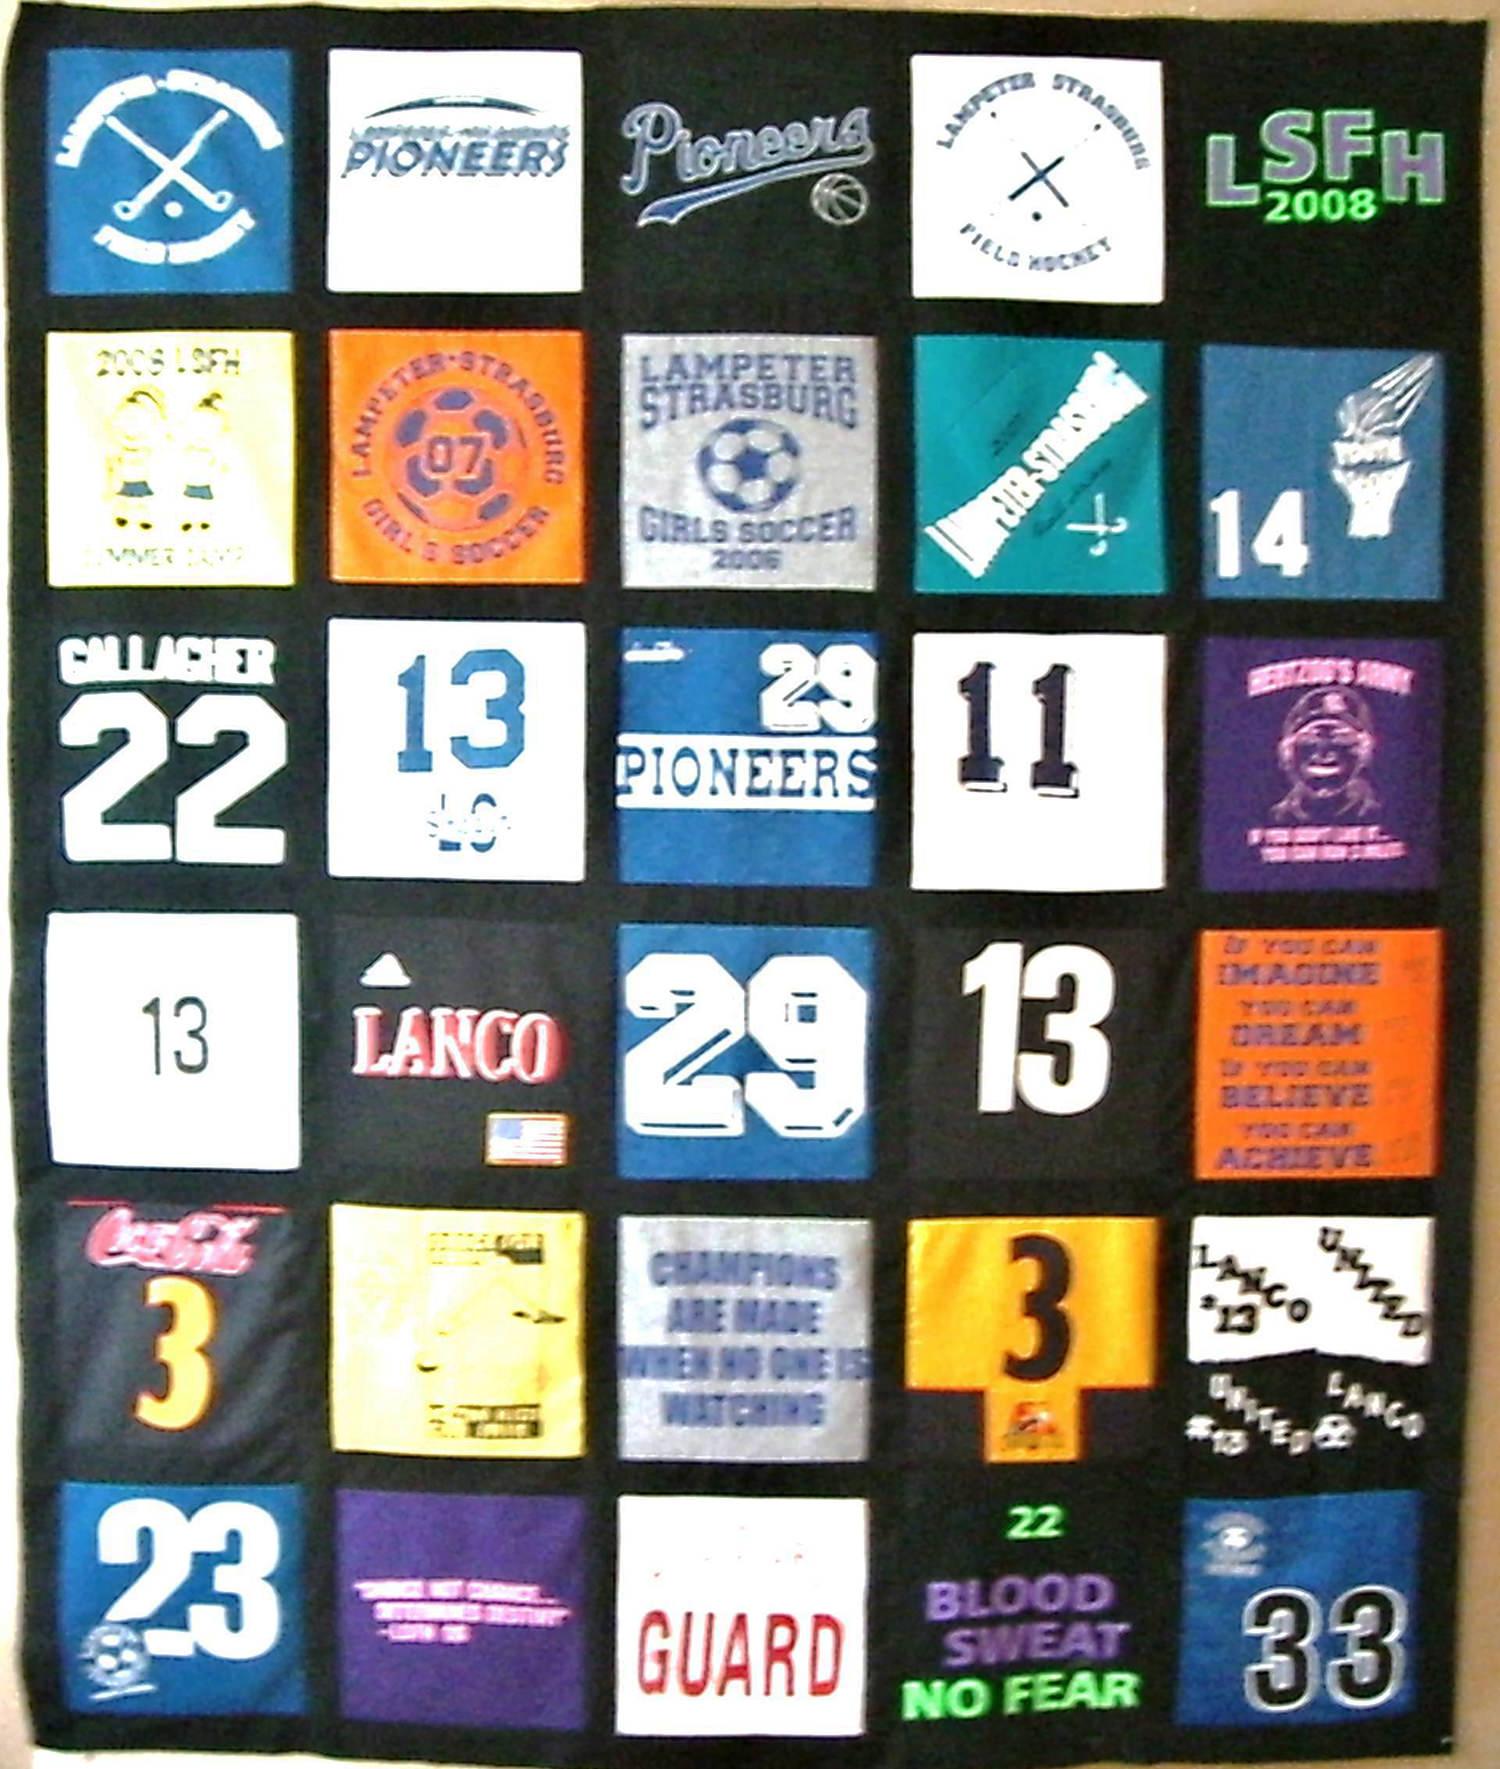 custom-t-shirt-quilts-DBH-designs-willow-street-pennsylvania-7.jpg